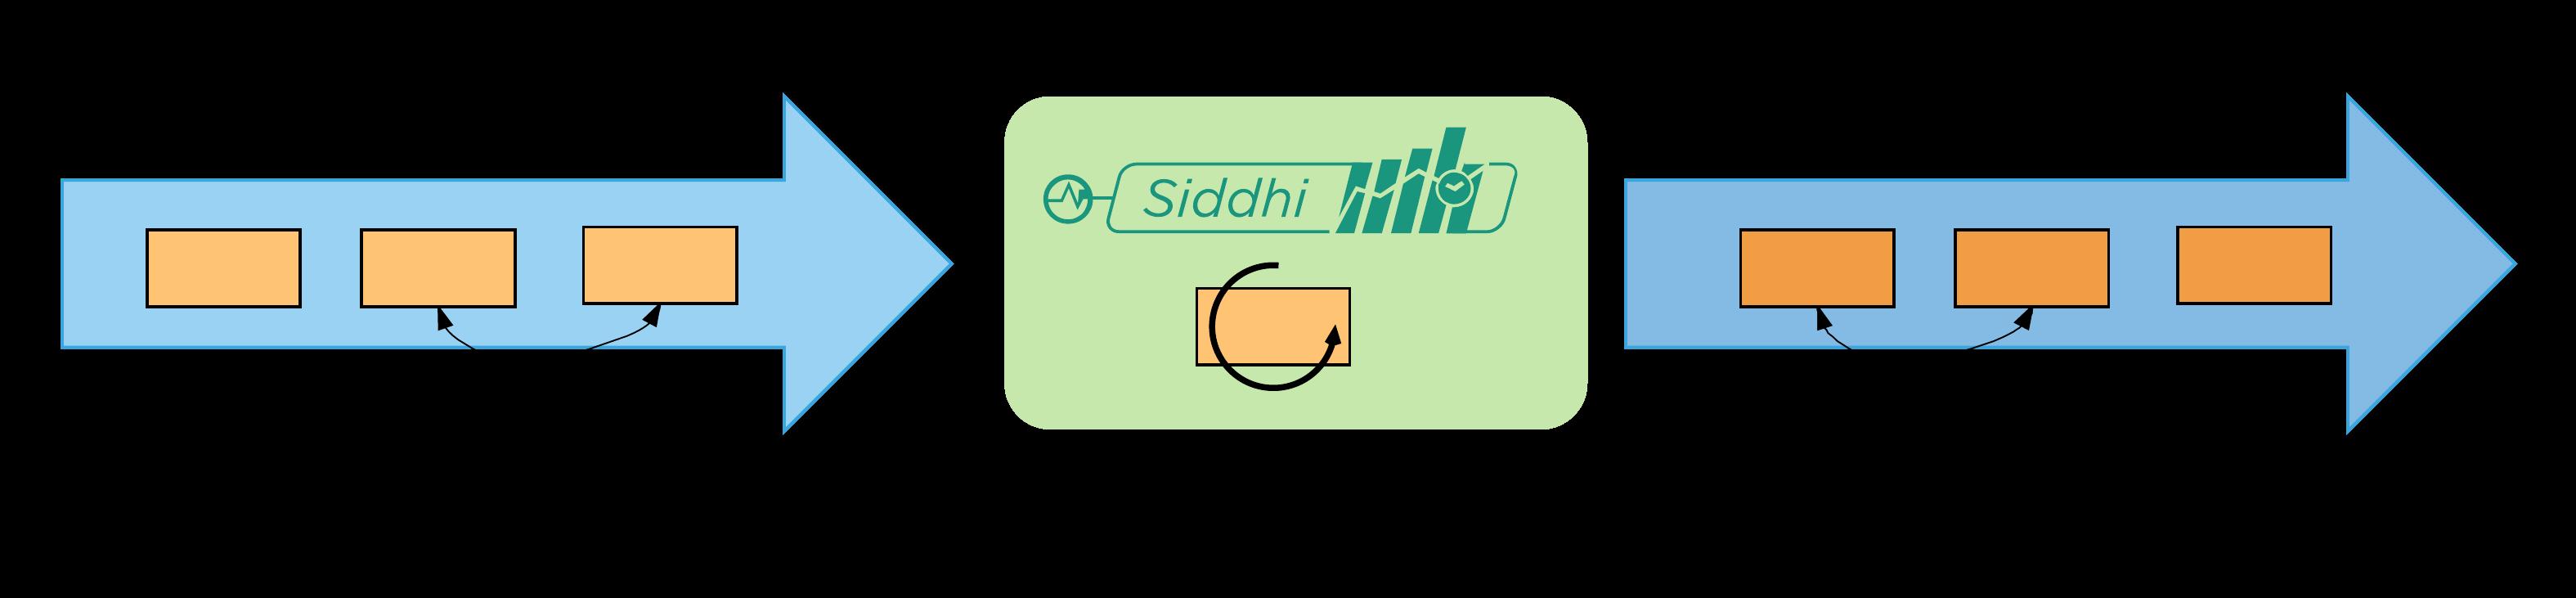 Quick Start - Siddhi